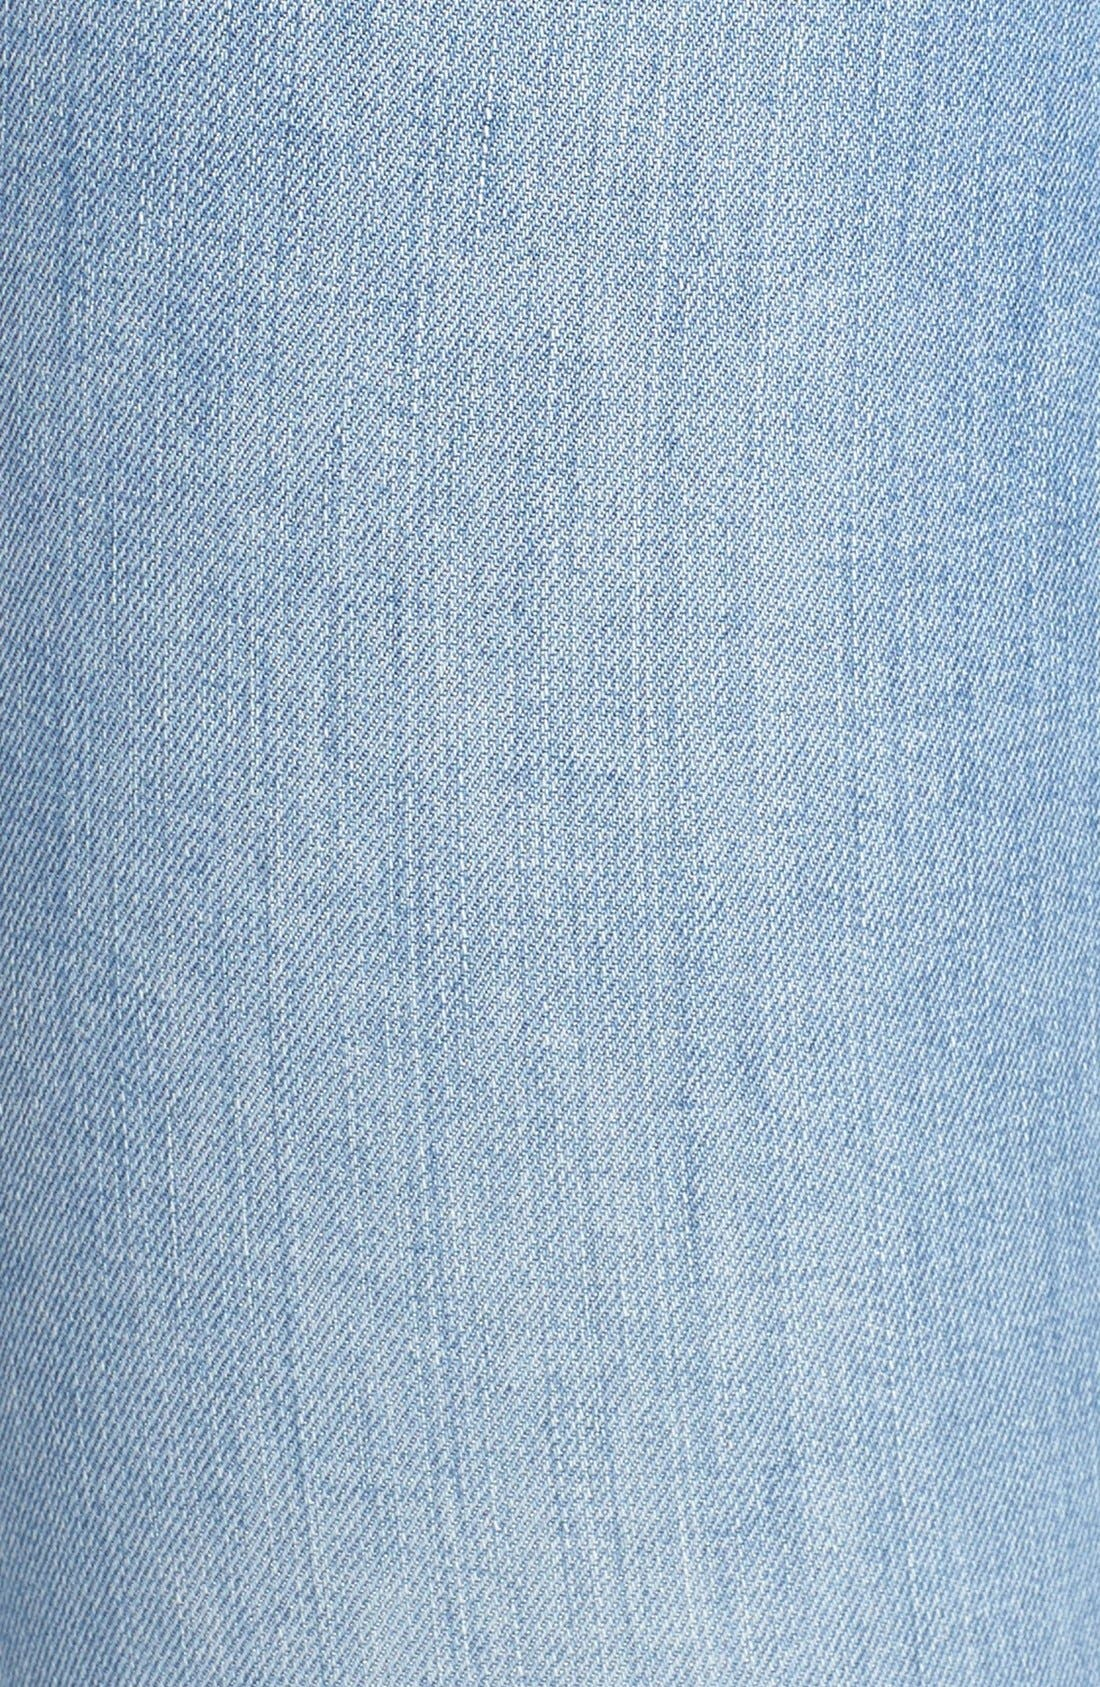 Alternate Image 5  - Joe's 'Vixen' Ankle Skinny Jeans with Phone Pocket (Mitzi)